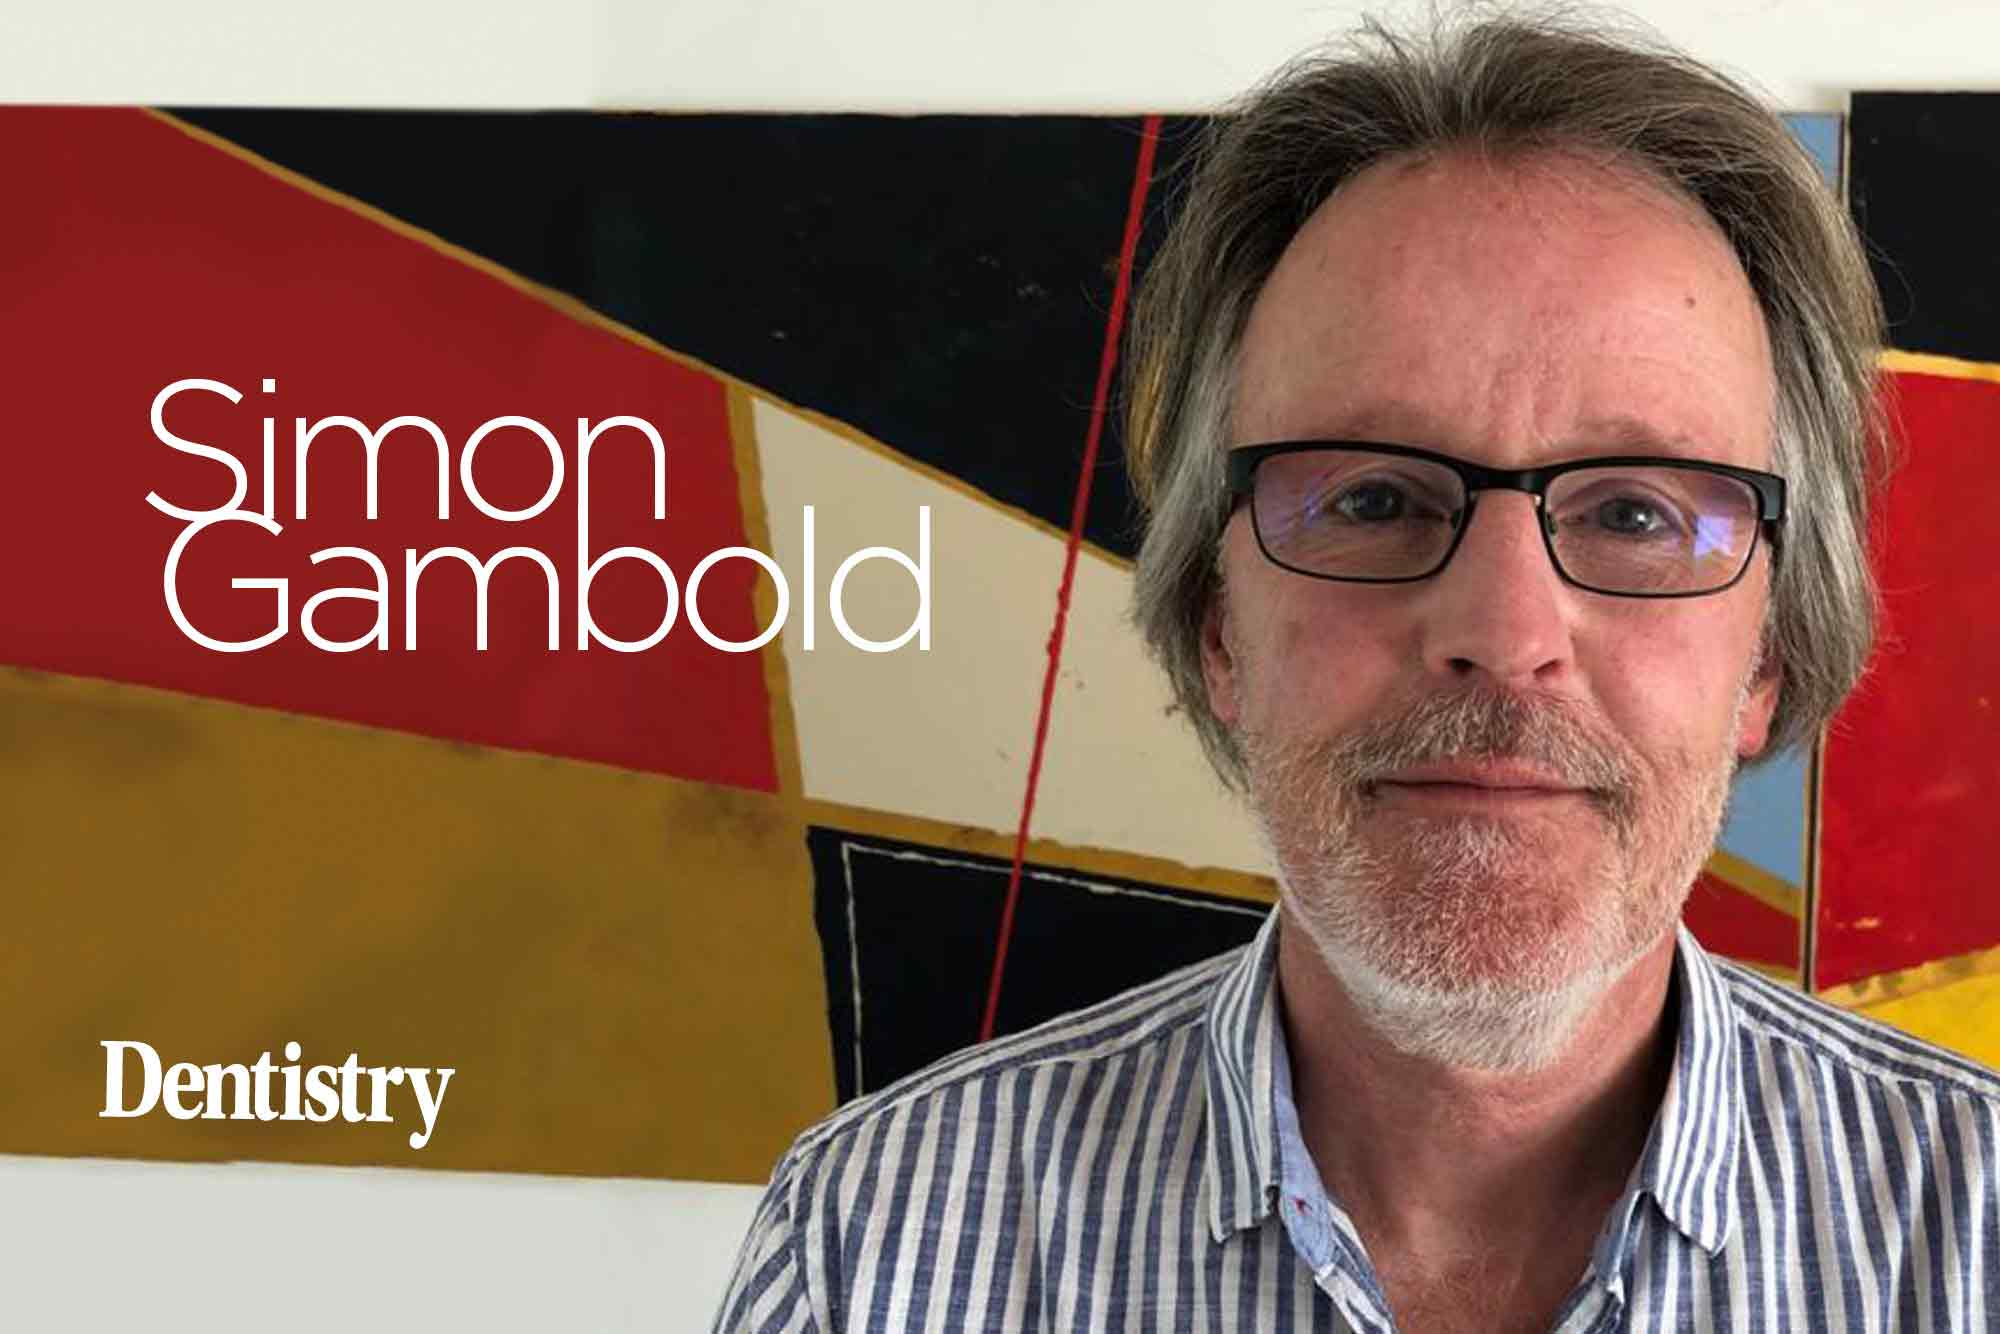 Dentistry podcast – Simon Gambold on team engagement